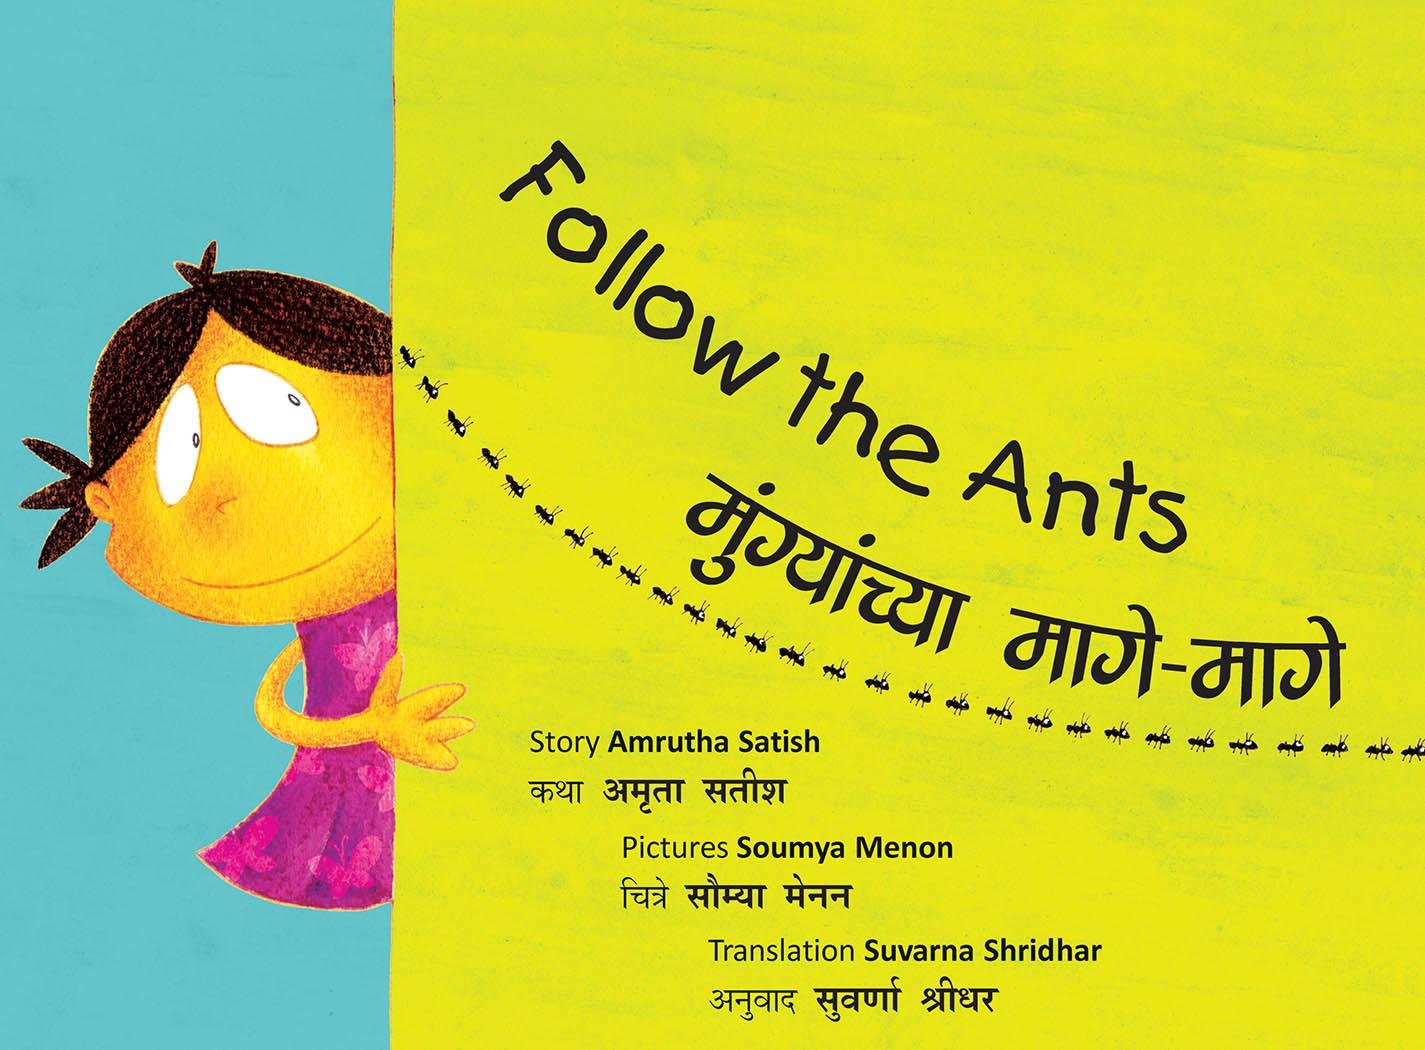 Follow The Ants/Mungyanchya Maage-Maage (English-Marathi)